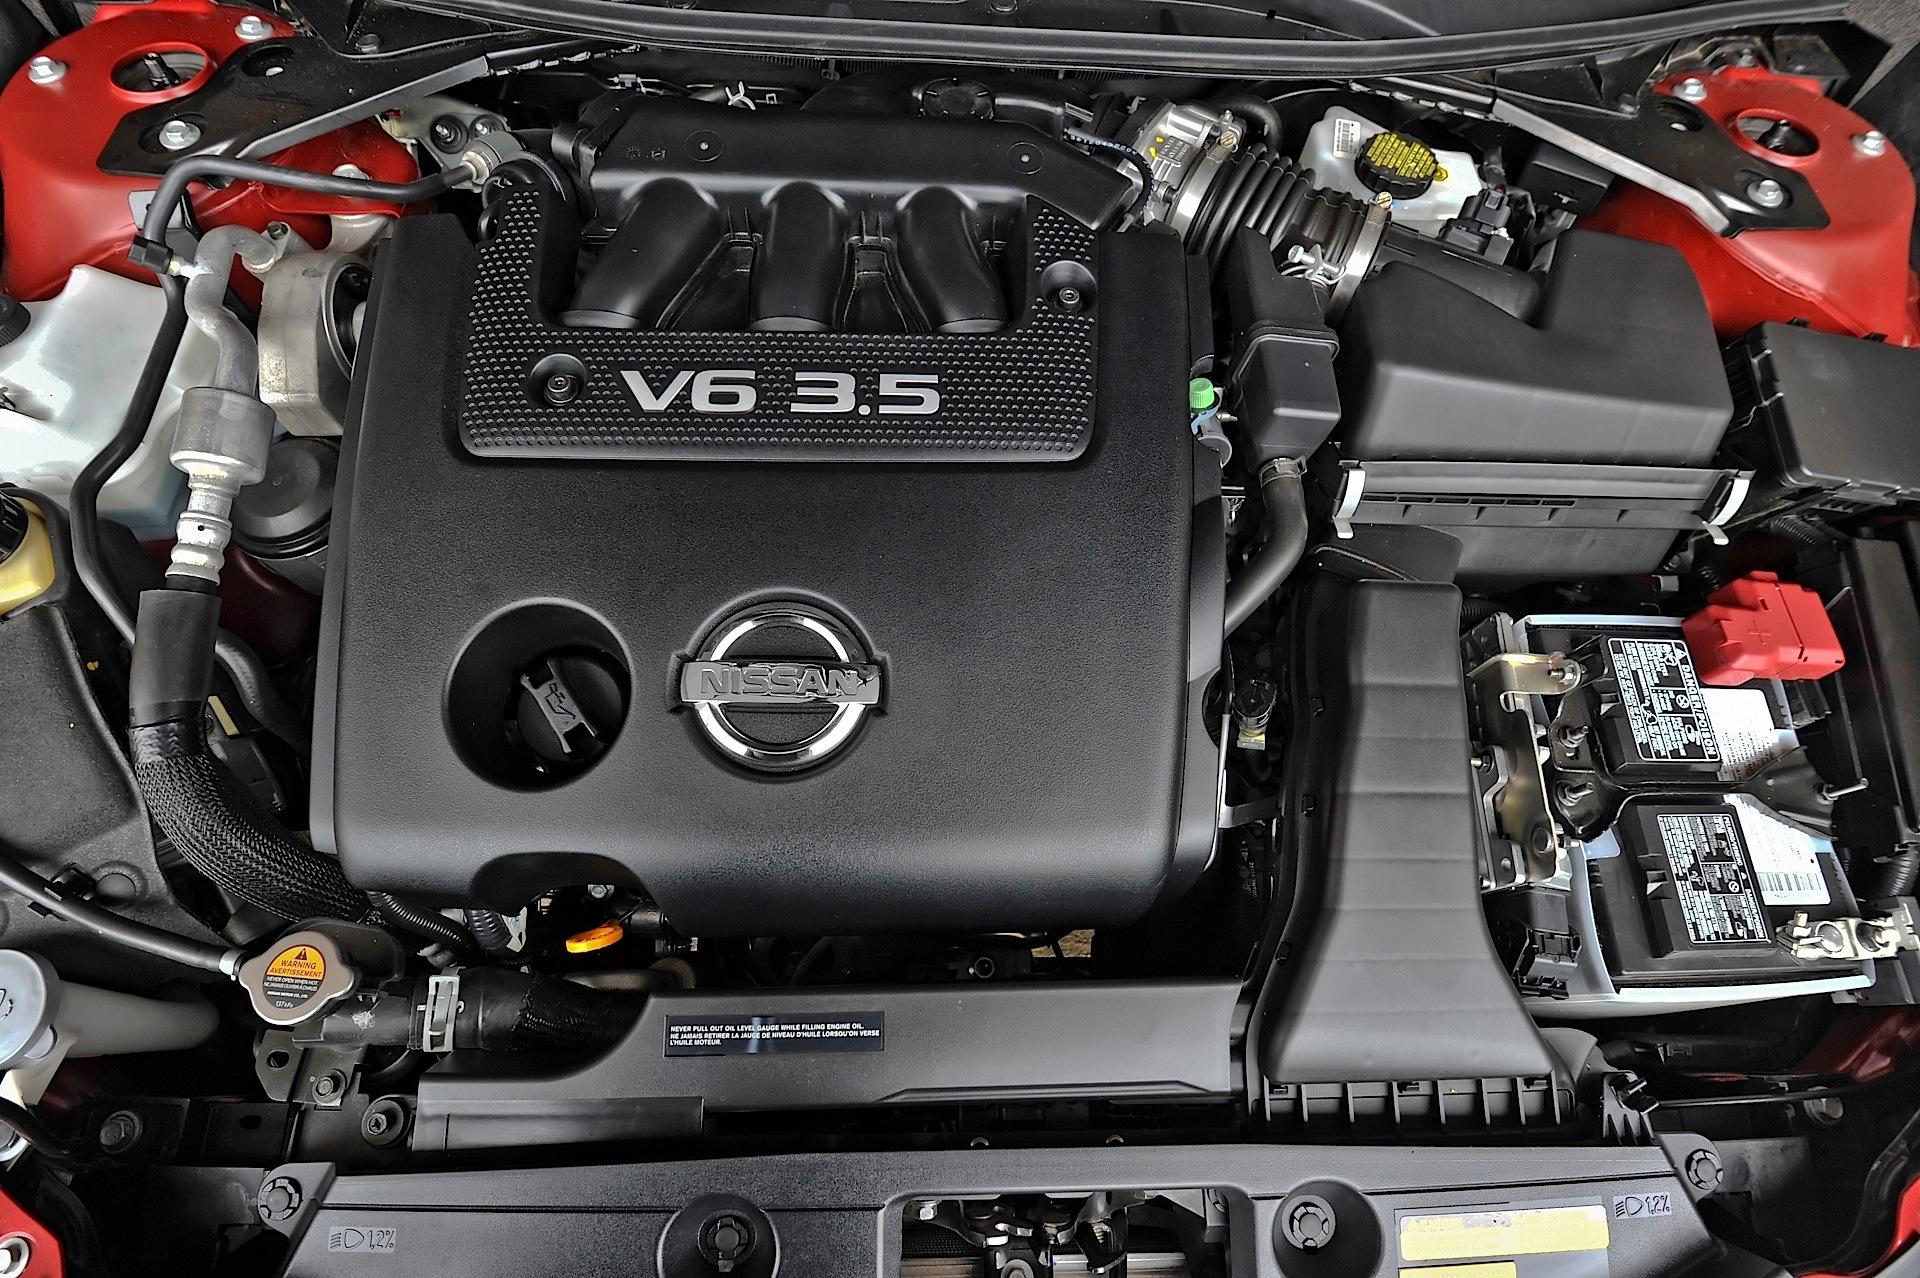 Nissan Altima Coupe Specs Photos 2012 2013 2014 2015 2016 2017 2018 2019 2020 2021 Autoevolution